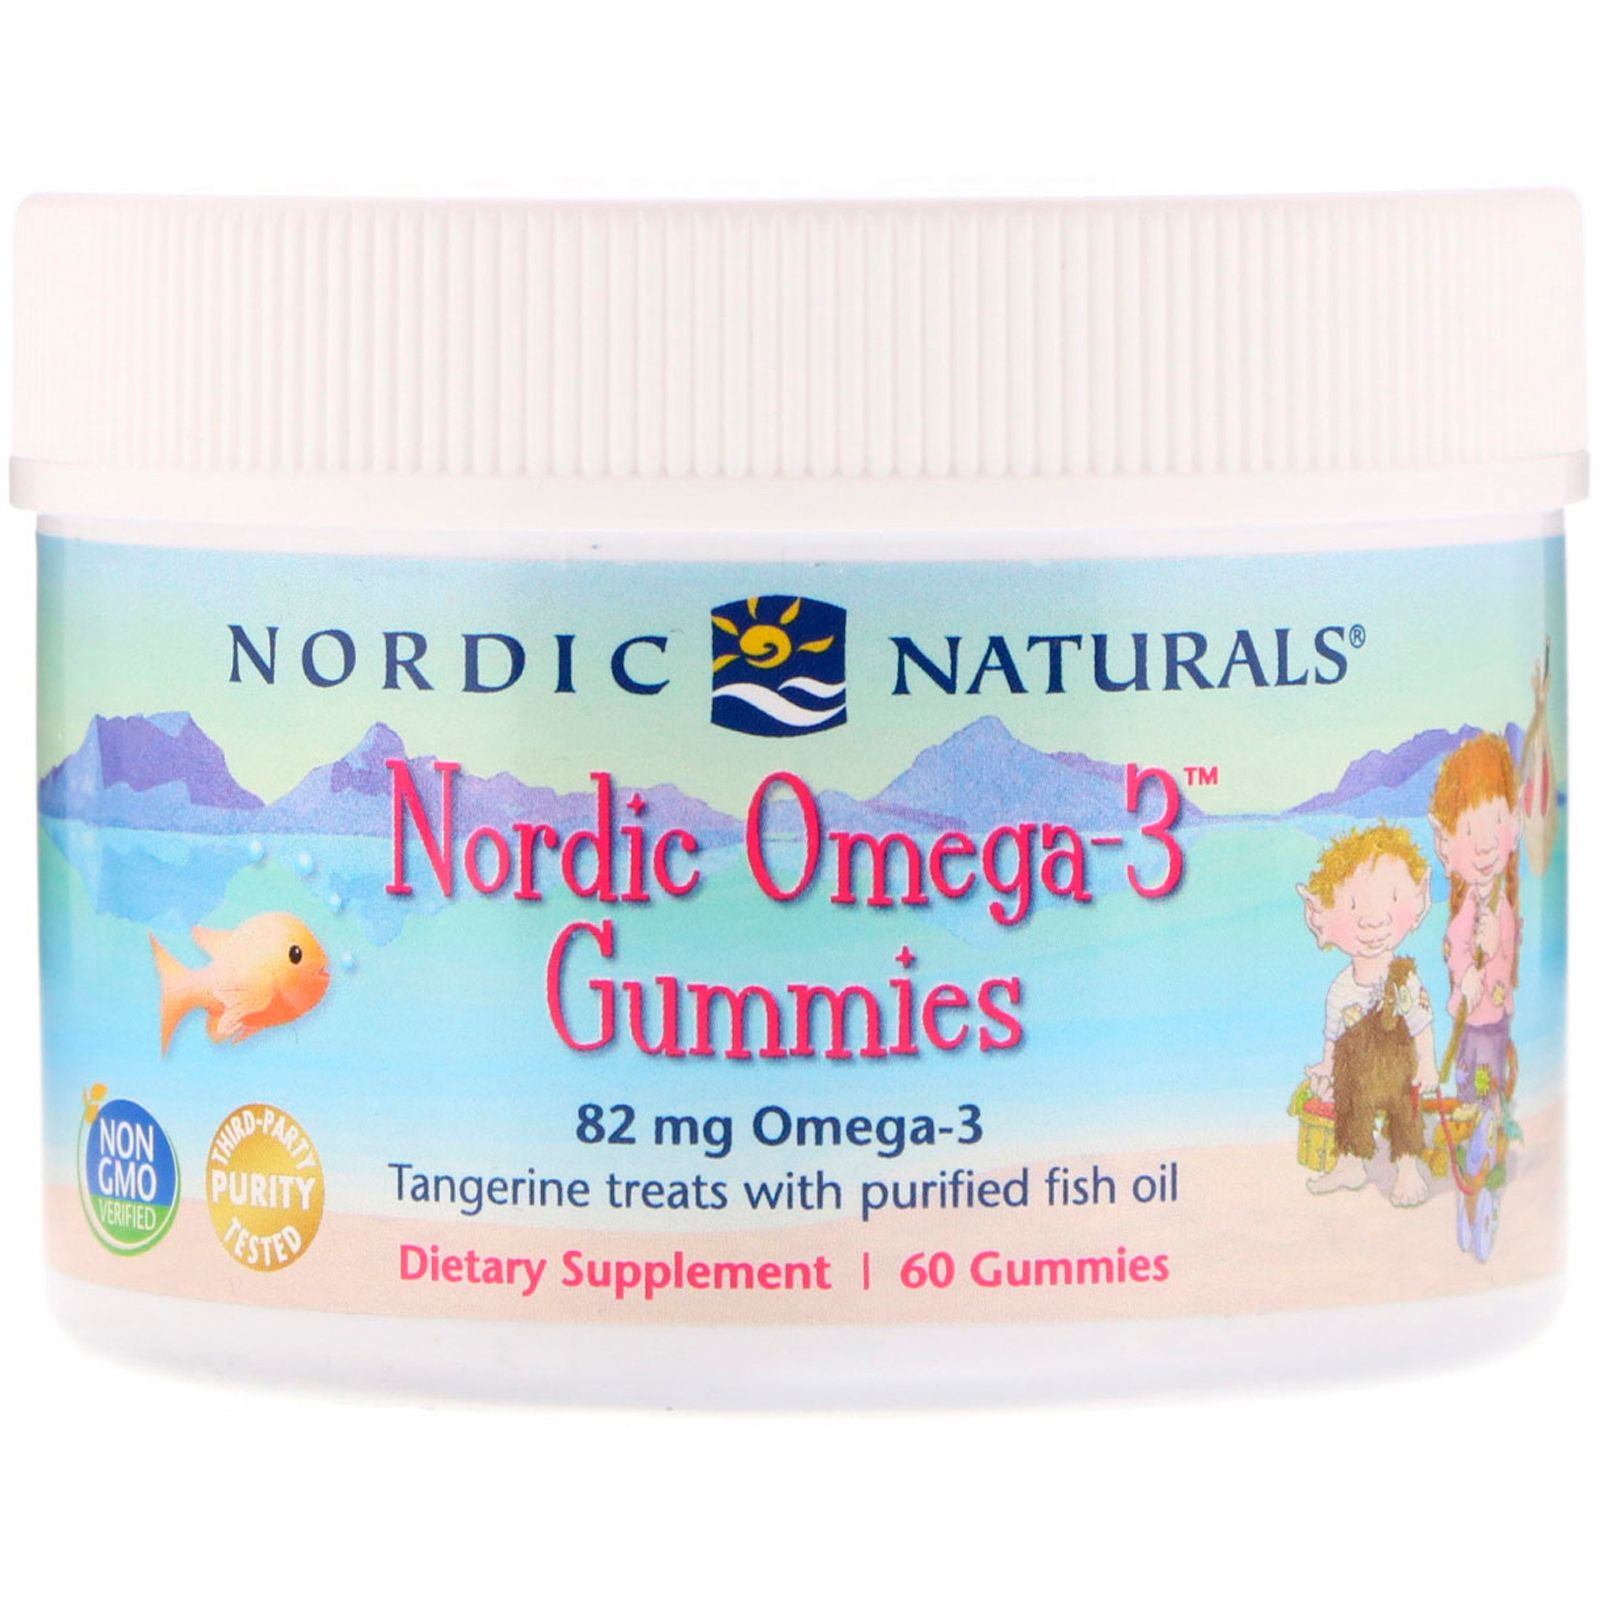 Nordic naturals nordic omega3 gummies tangerine treats